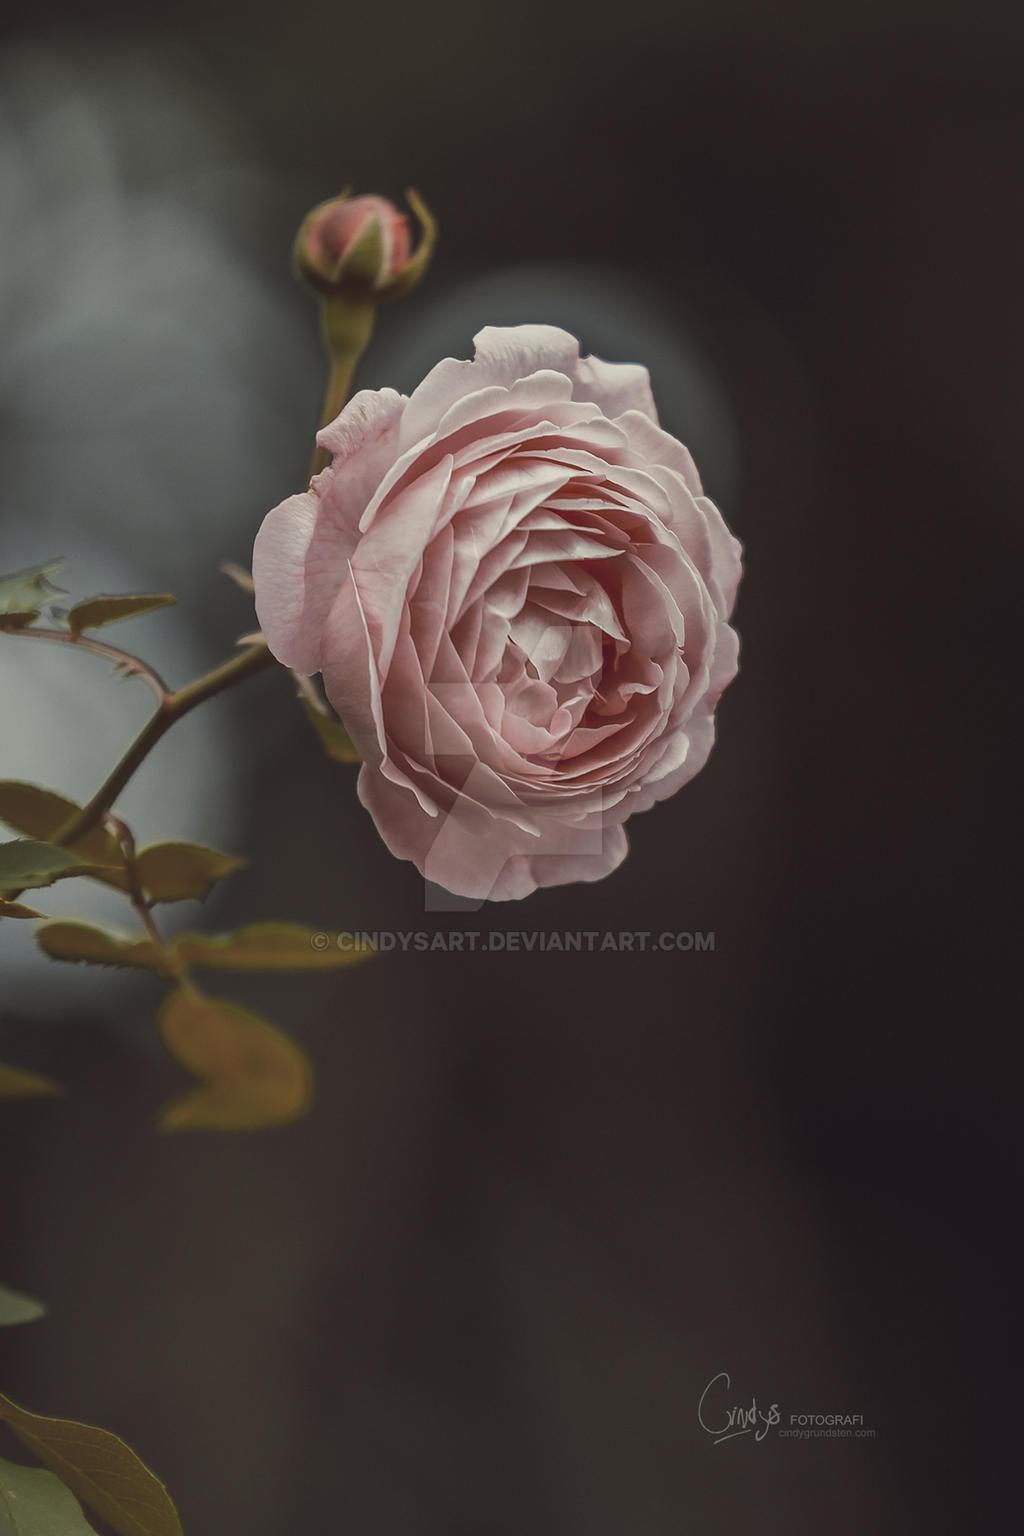 Romance by CindysArt